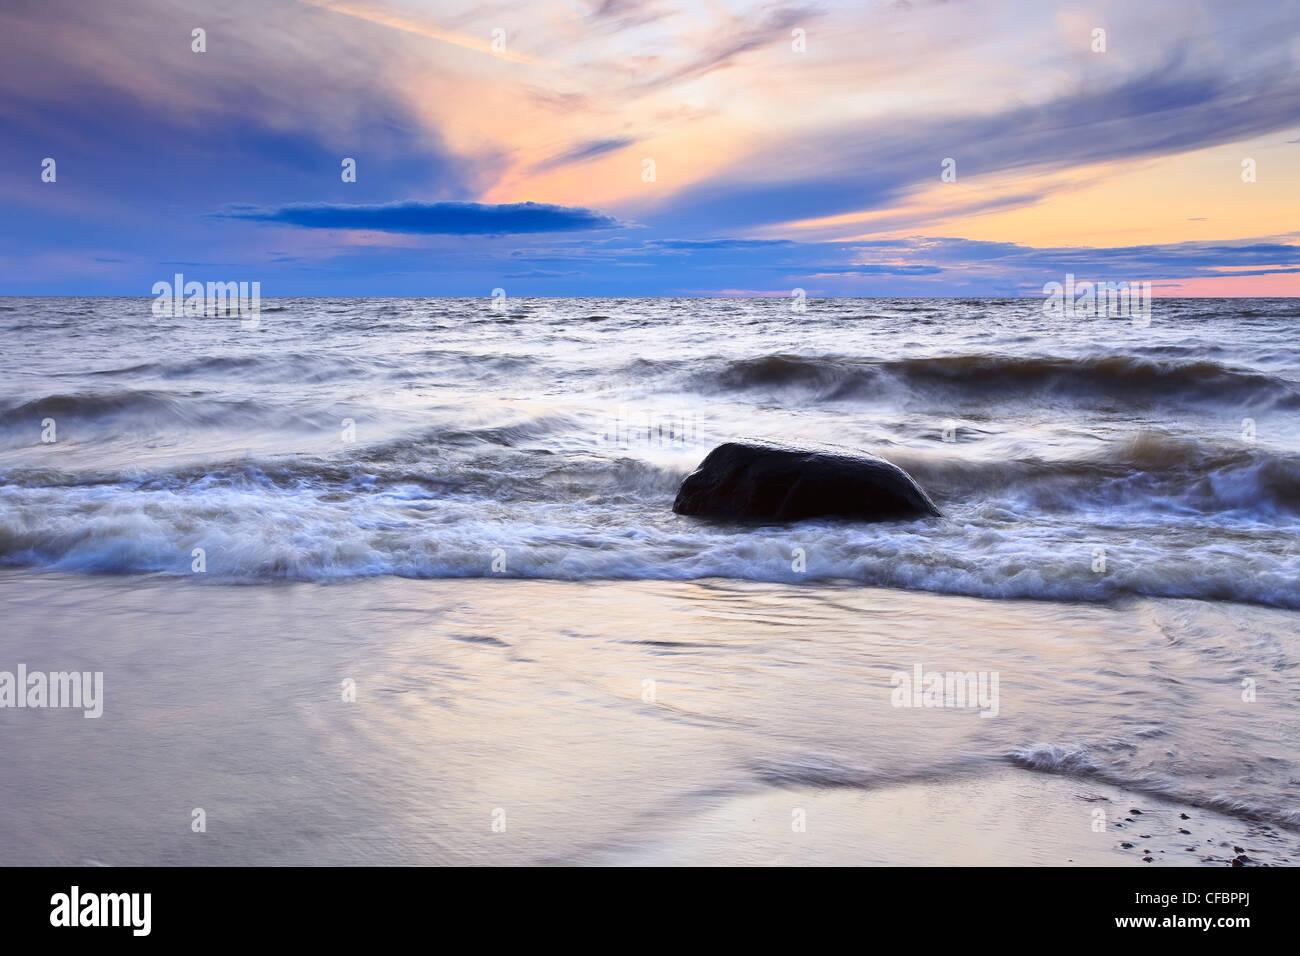 Waves on Lake Winnipeg at sunset. Lester Beach, Manitoba, Canada. - Stock Image